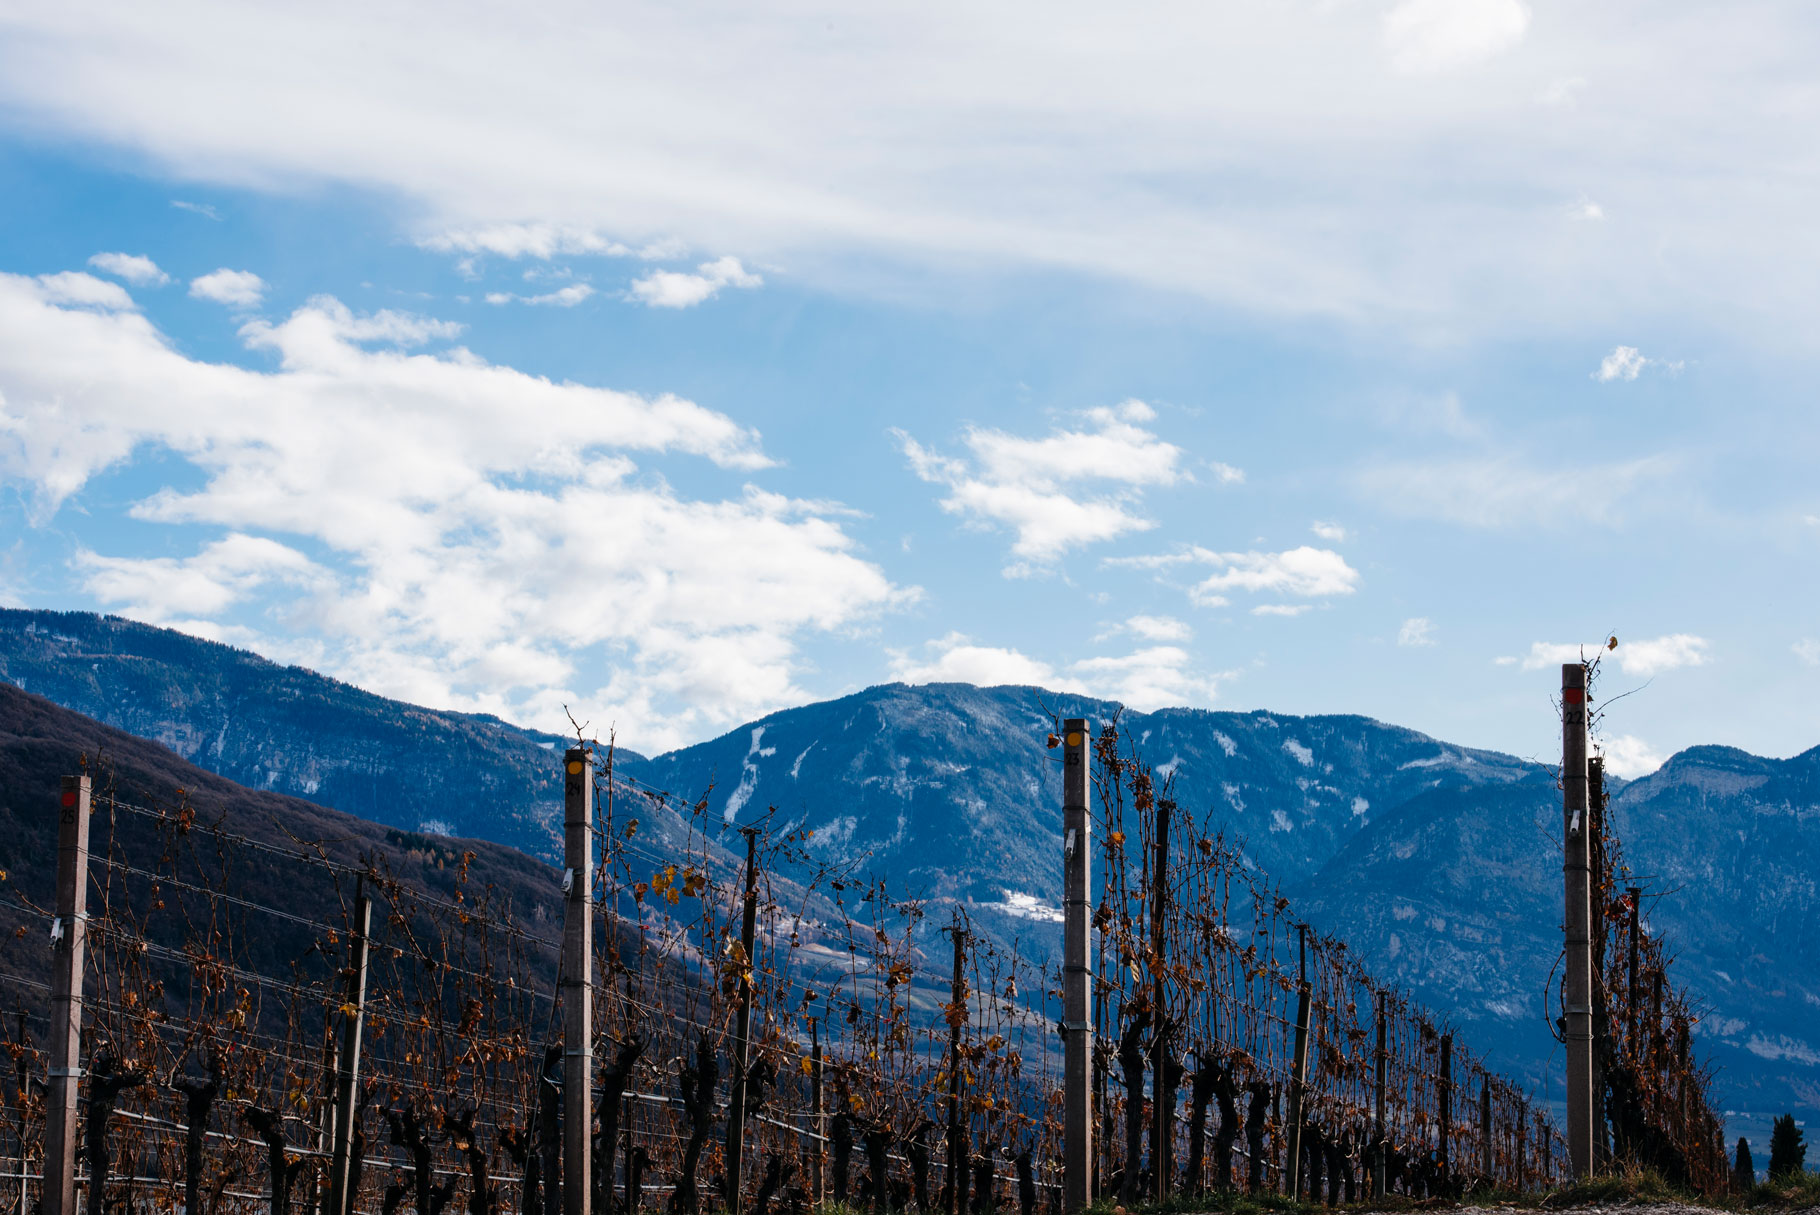 Manincor vineyards   Caldaro   Alto Adige   Italy